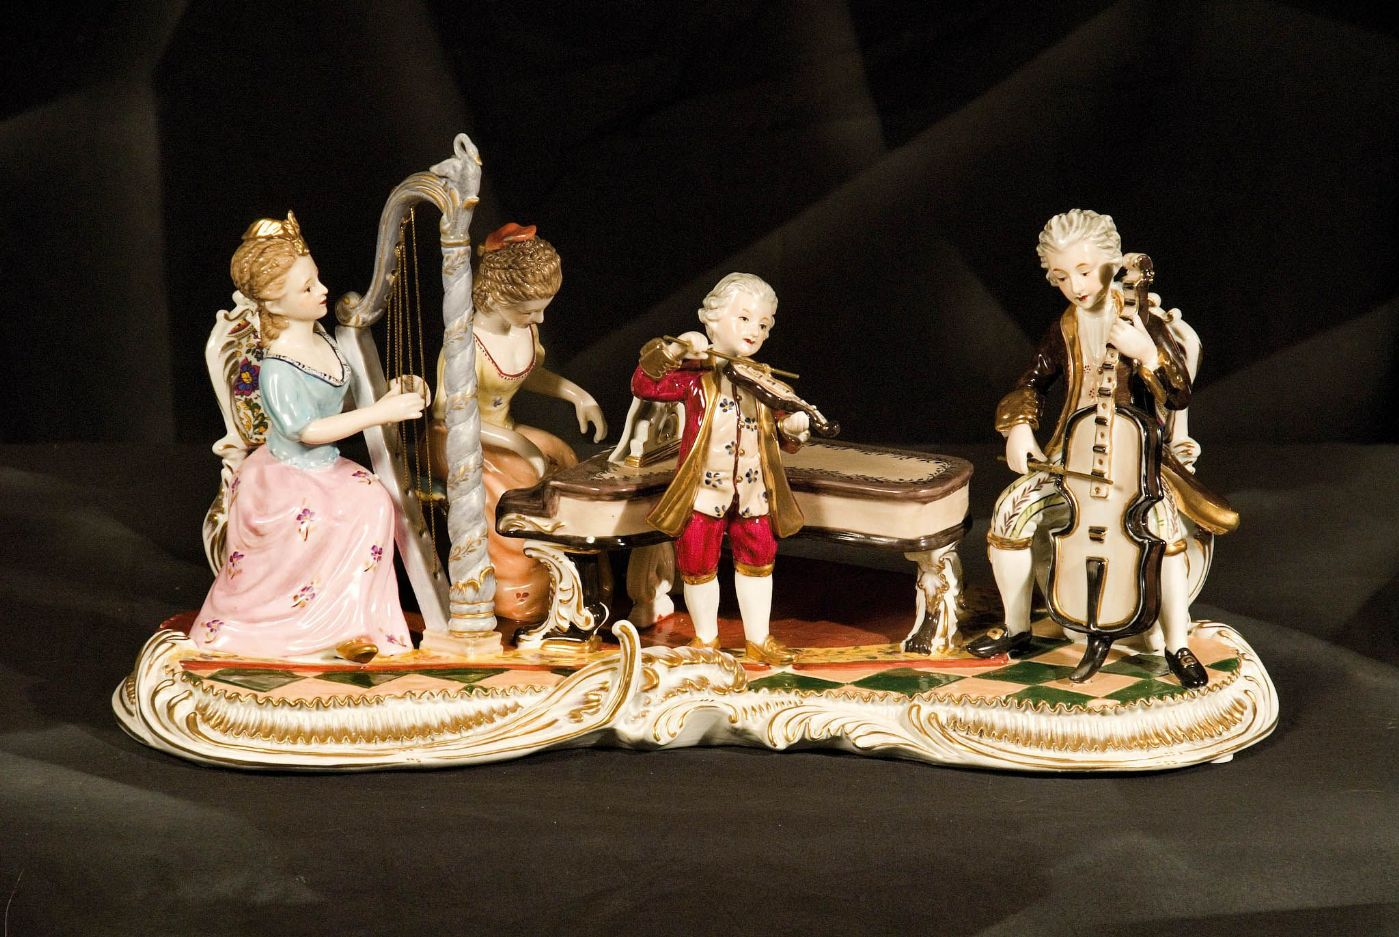 CHAMBER MUSIC CONCERT - English porcelain Derby Crown Porcelain Co